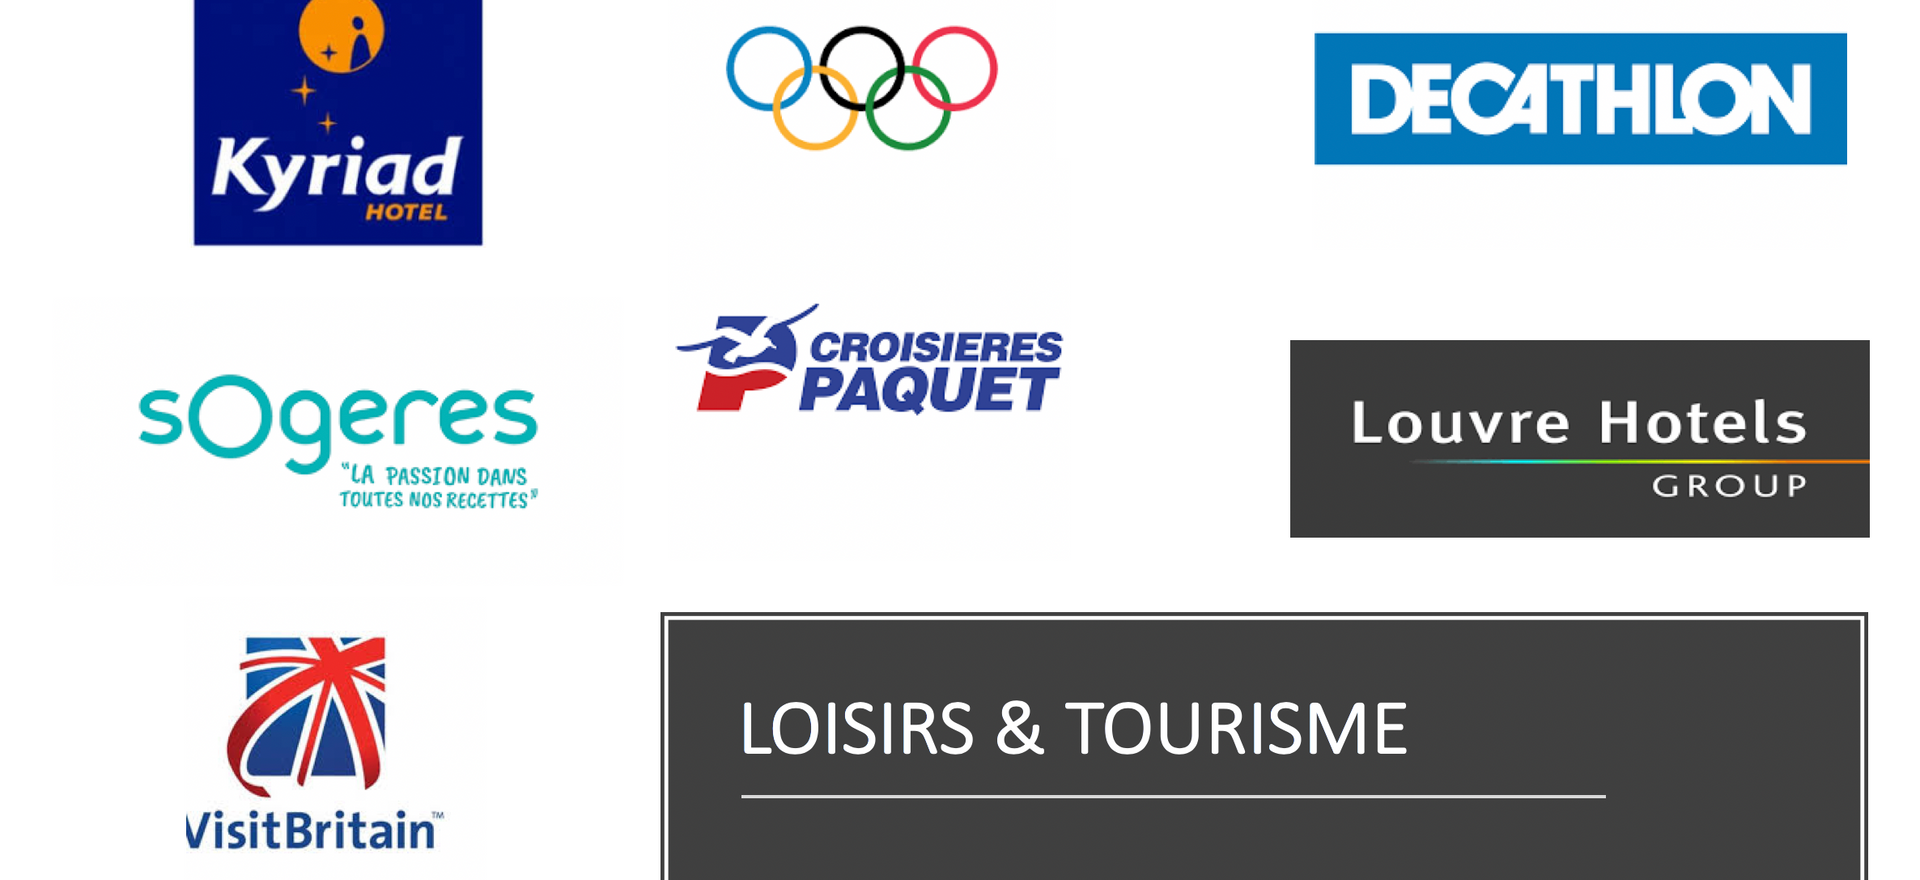 Loisirs & Tourisme